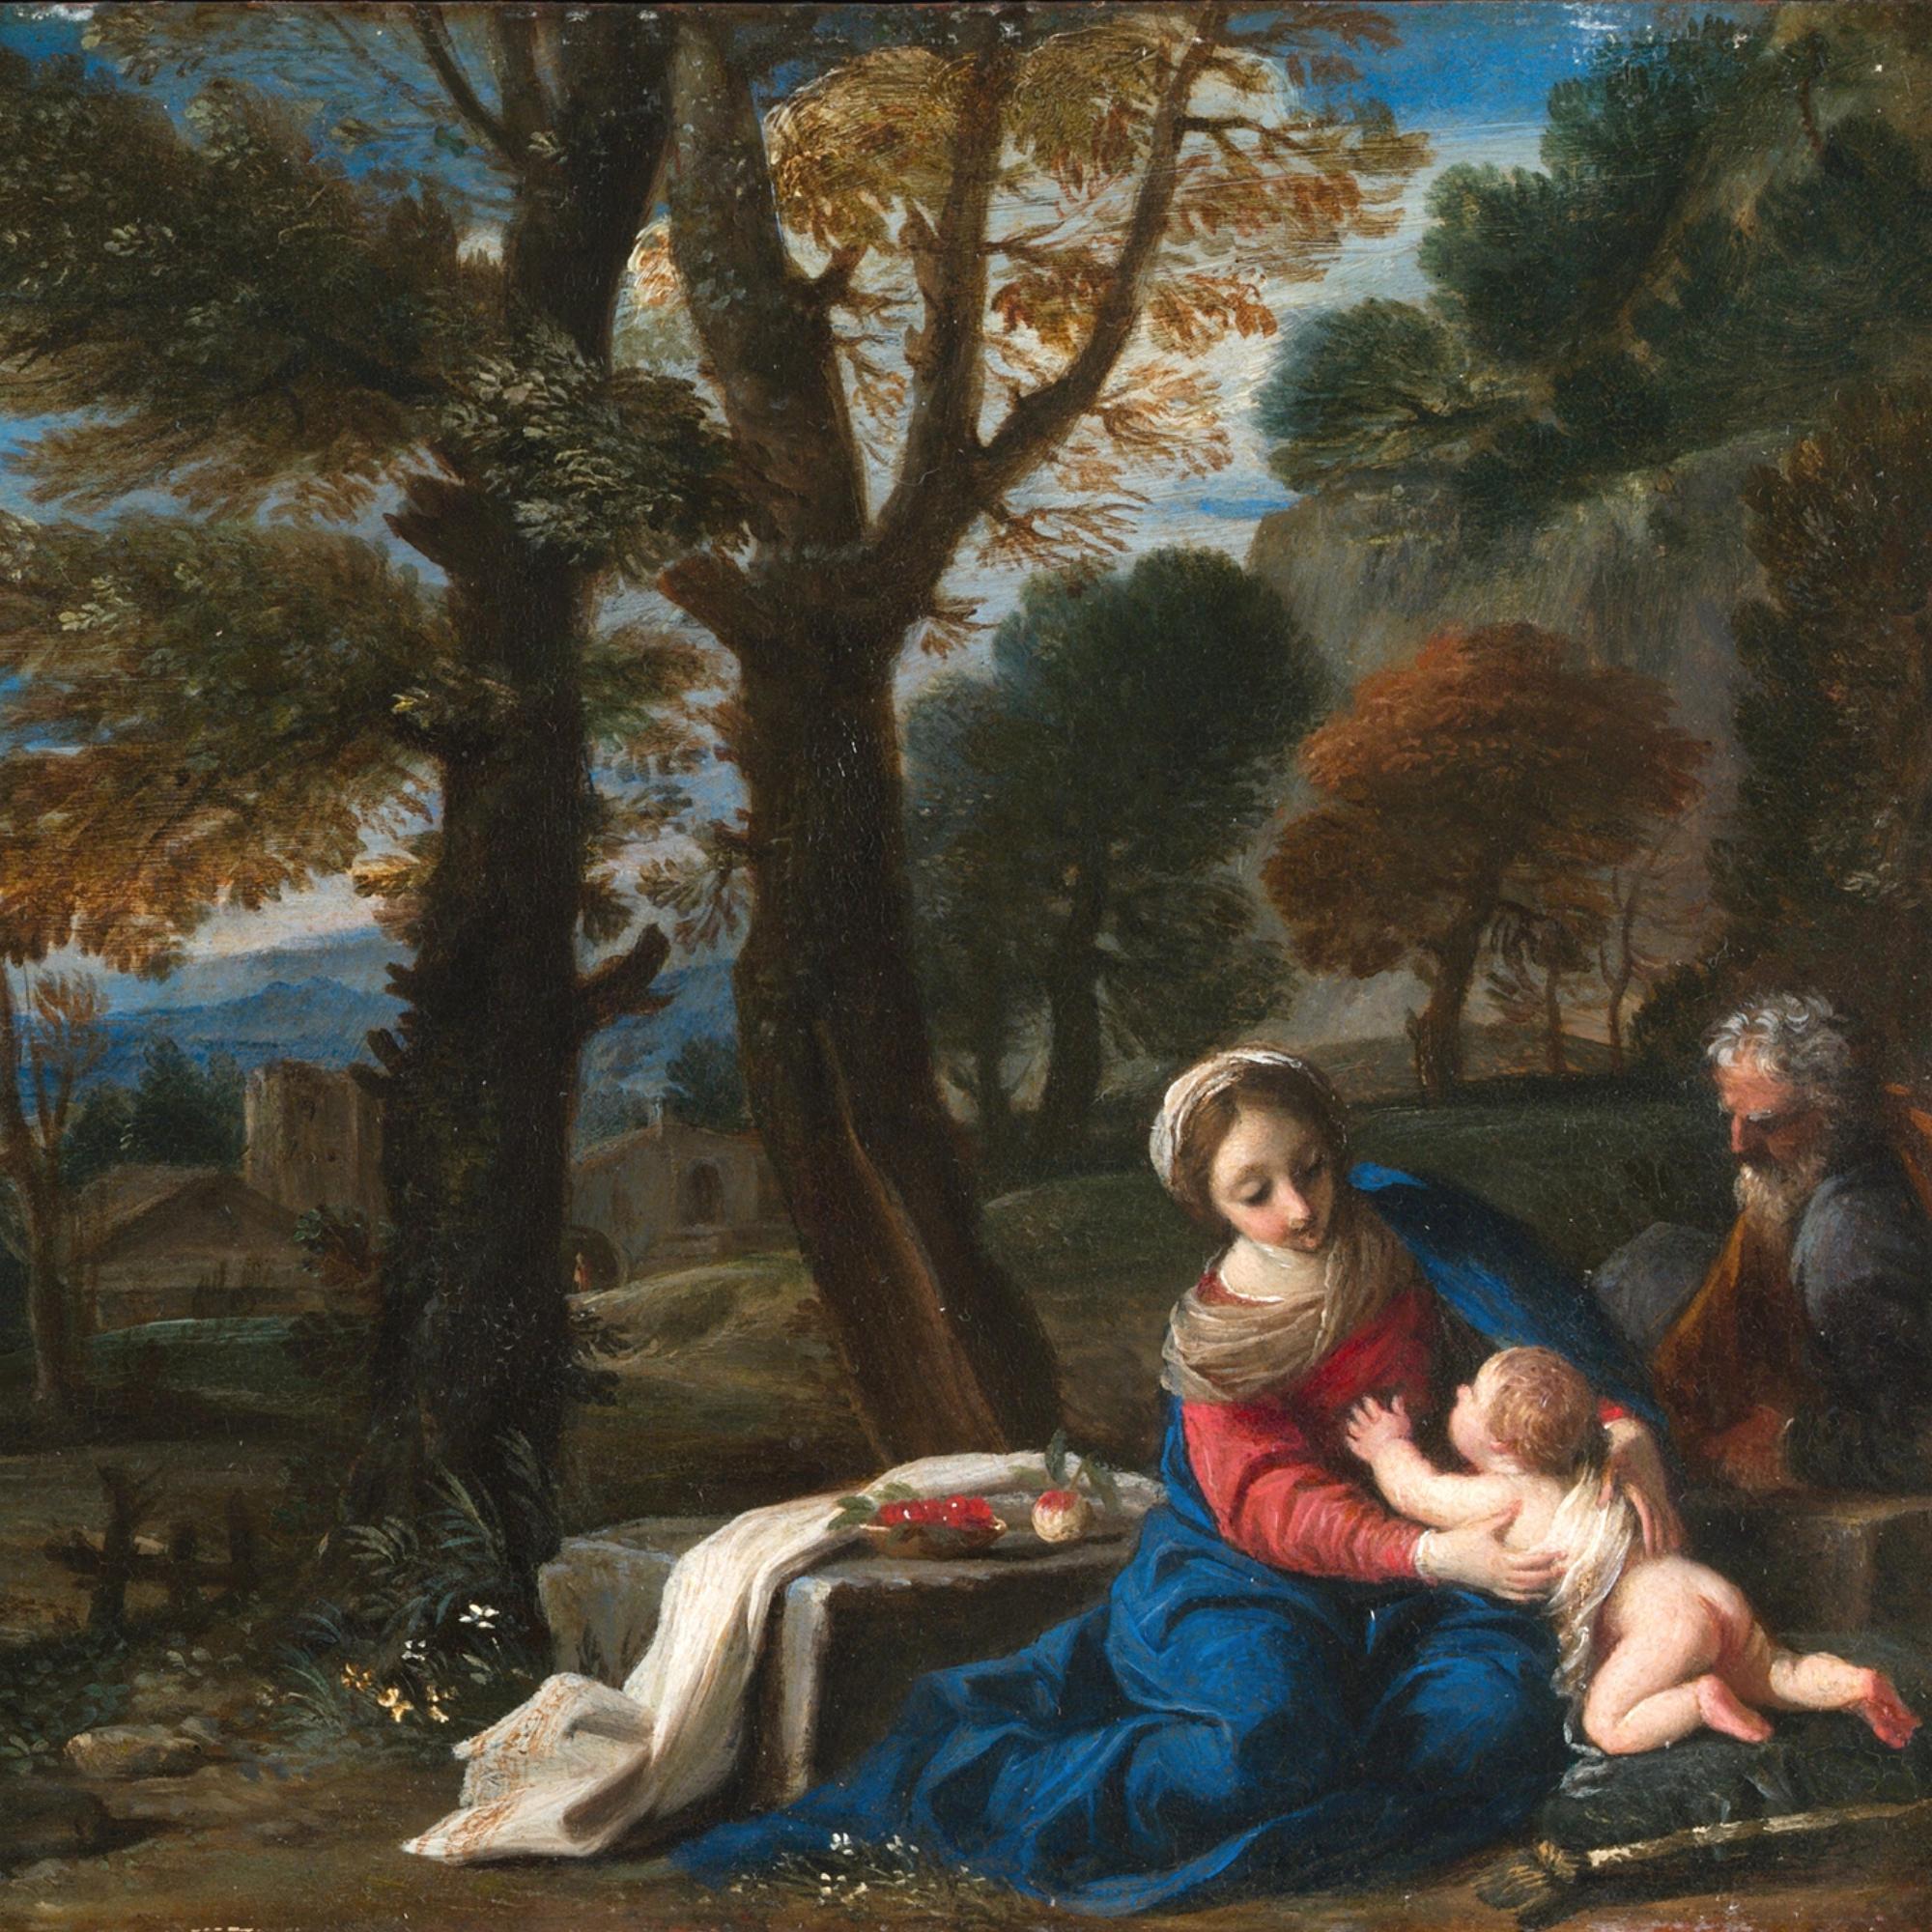 St Joseph's Role in Jesus's Hidden Life at Nazareth